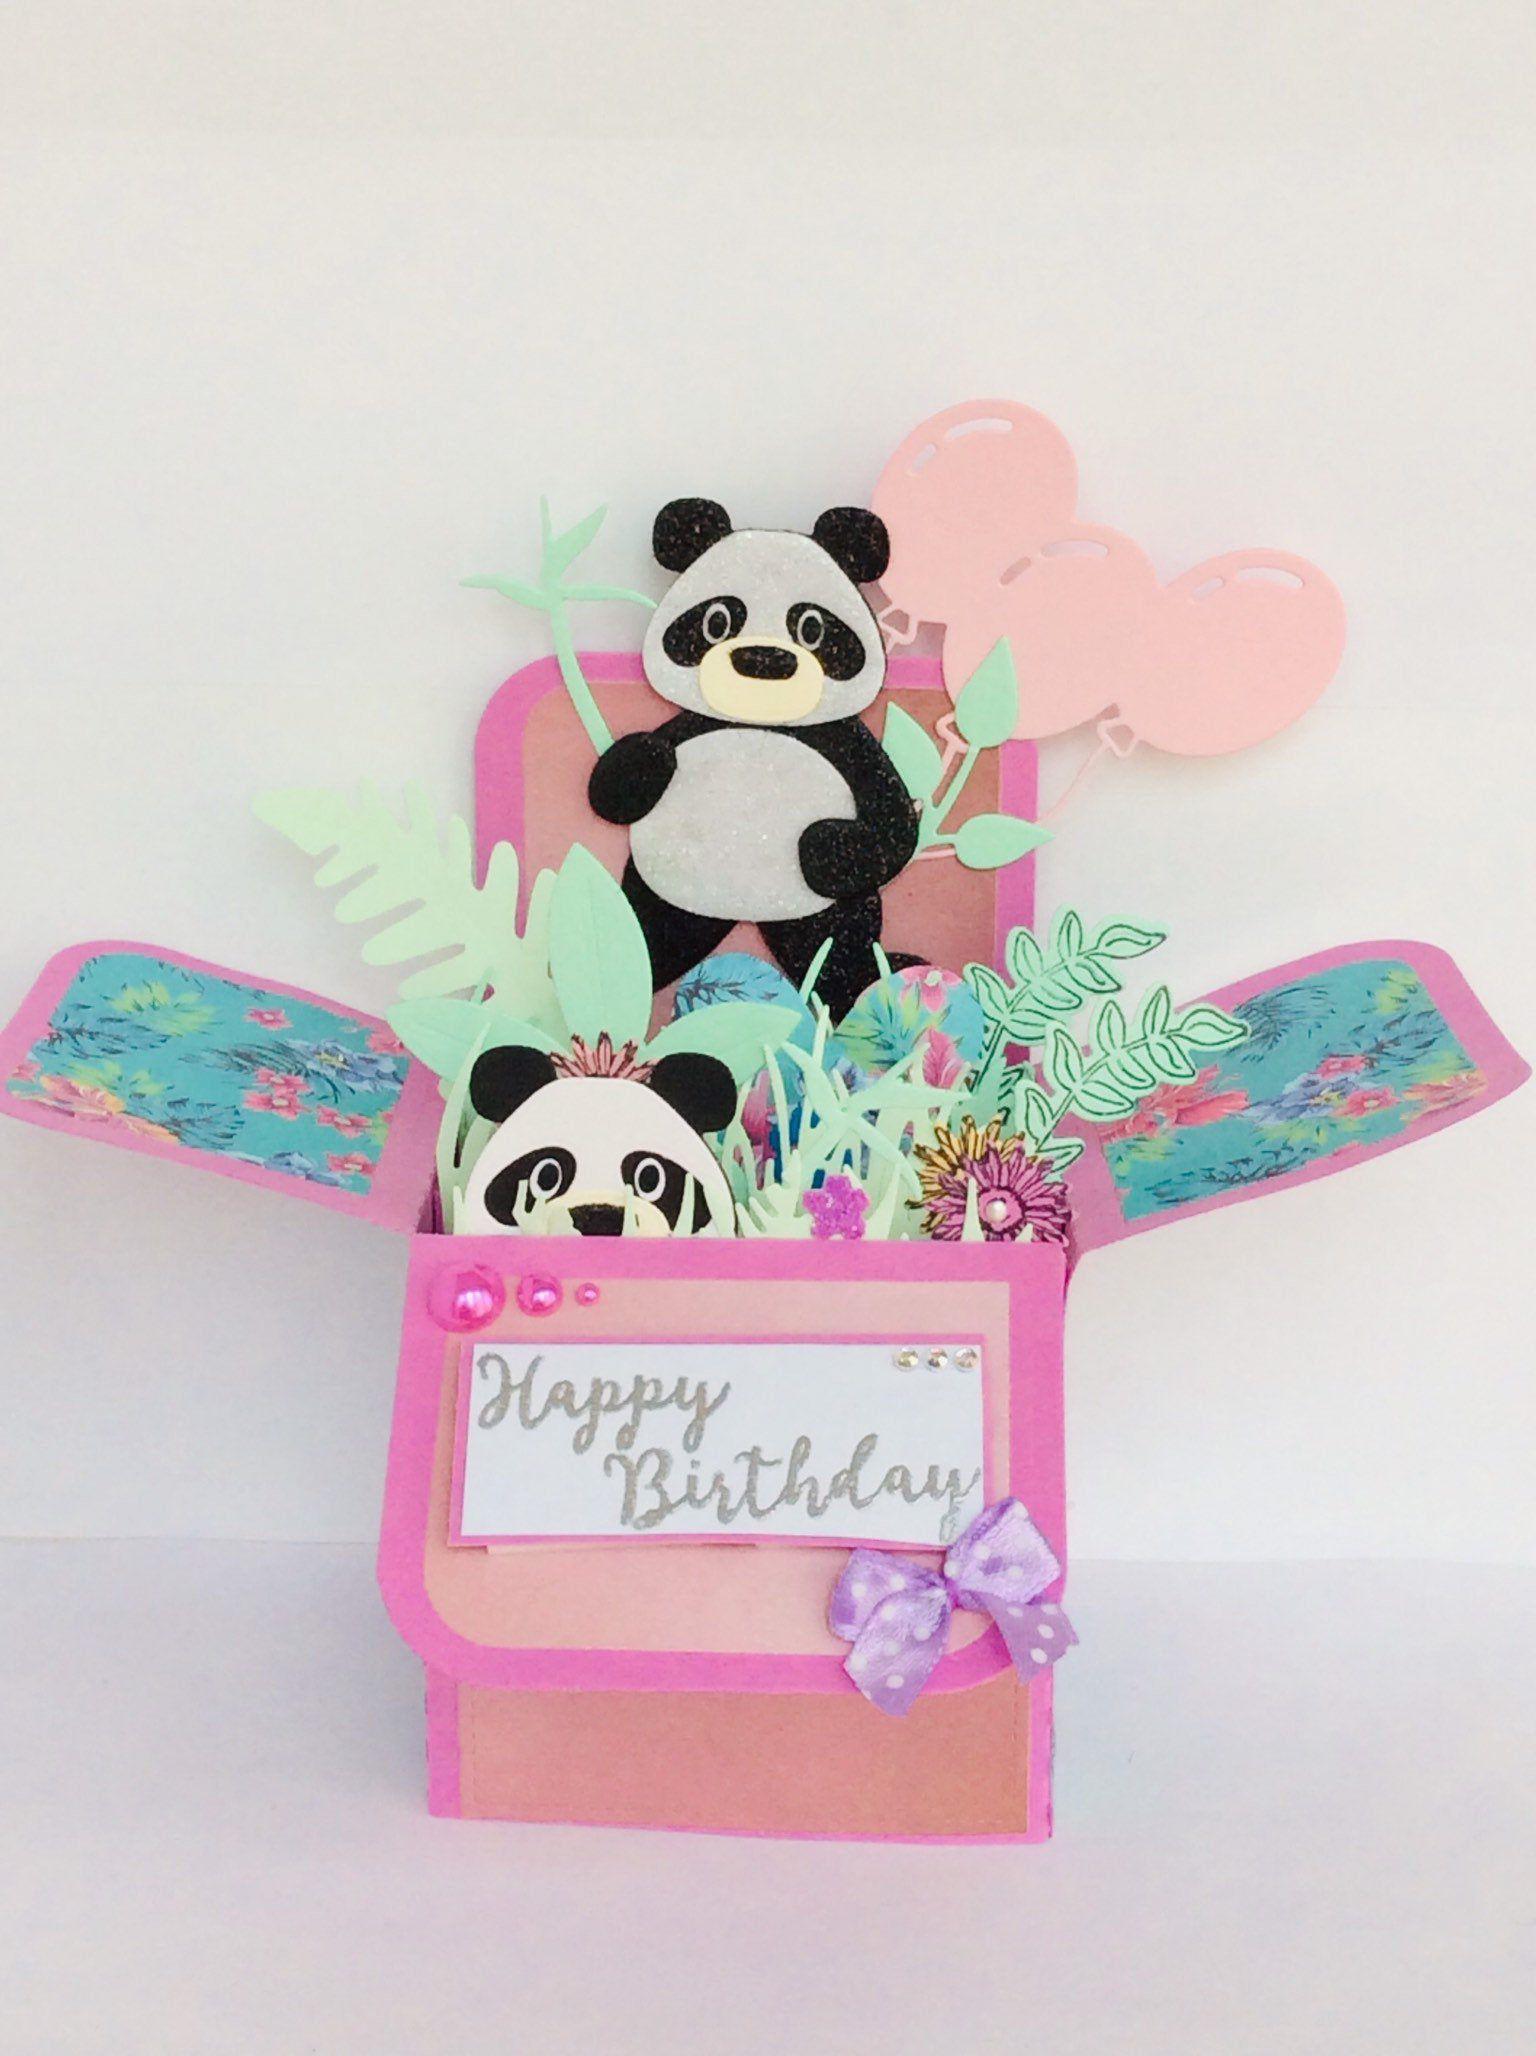 Panda Happy Birthday 1st 3rd 21st 60th Panda Pop Up Card Etsy Boxed Birthday Cards Exploding Box Card Pop Up Box Cards